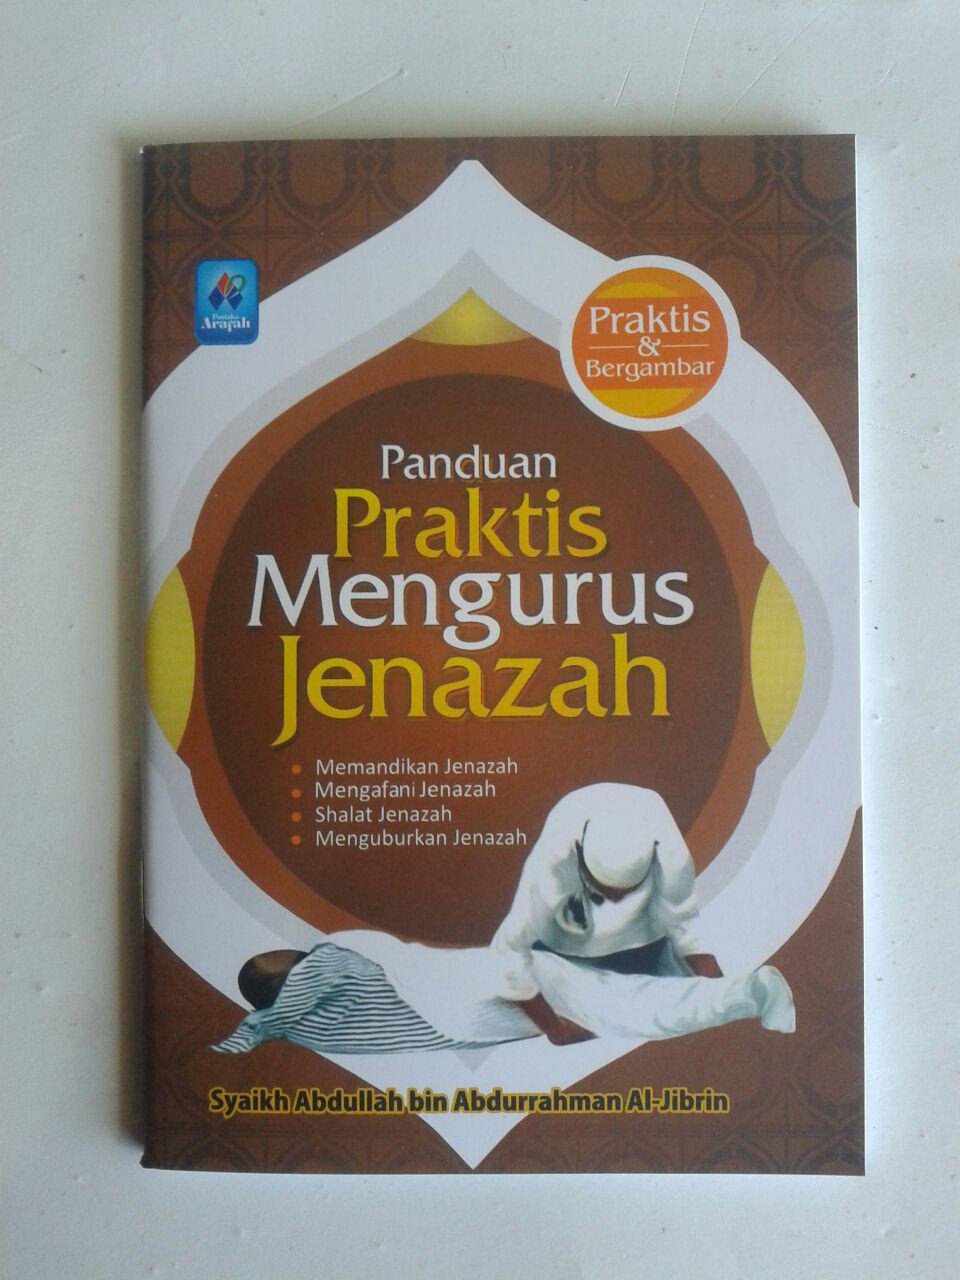 Buku Saku Panduan Praktis Mengurus Jenazah cover 2